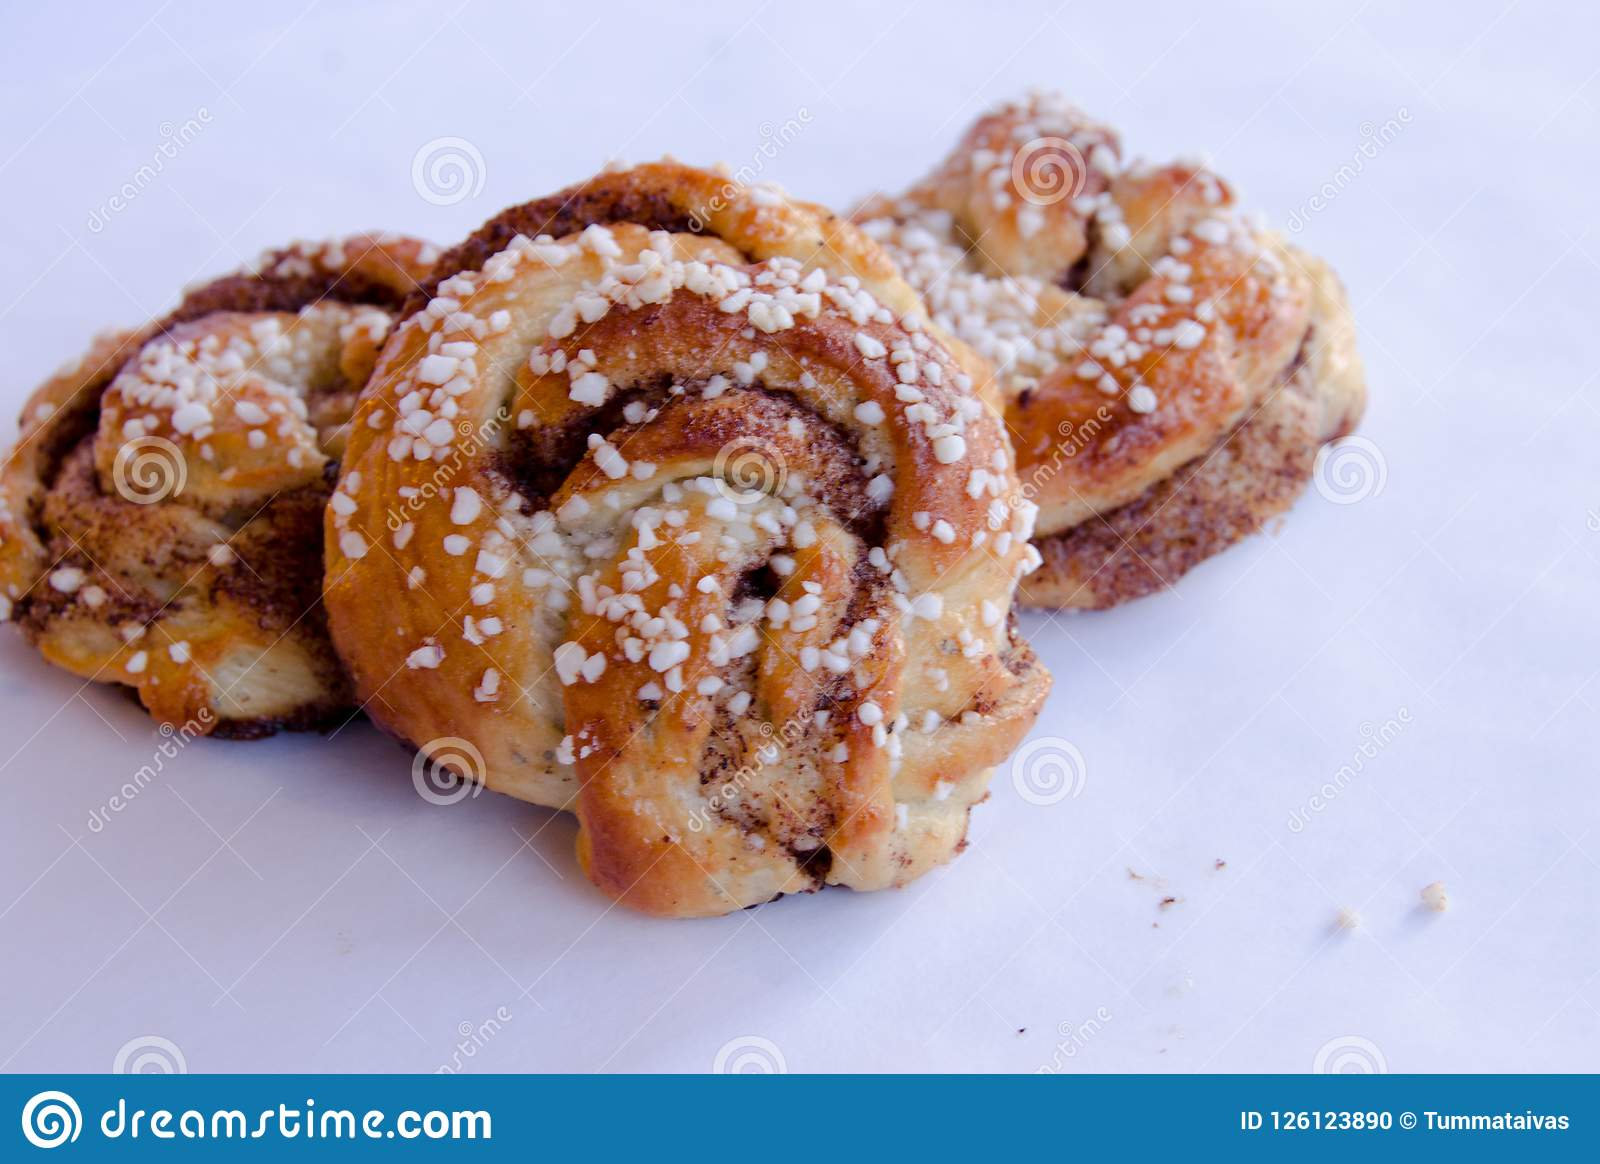 桂香小圆面包